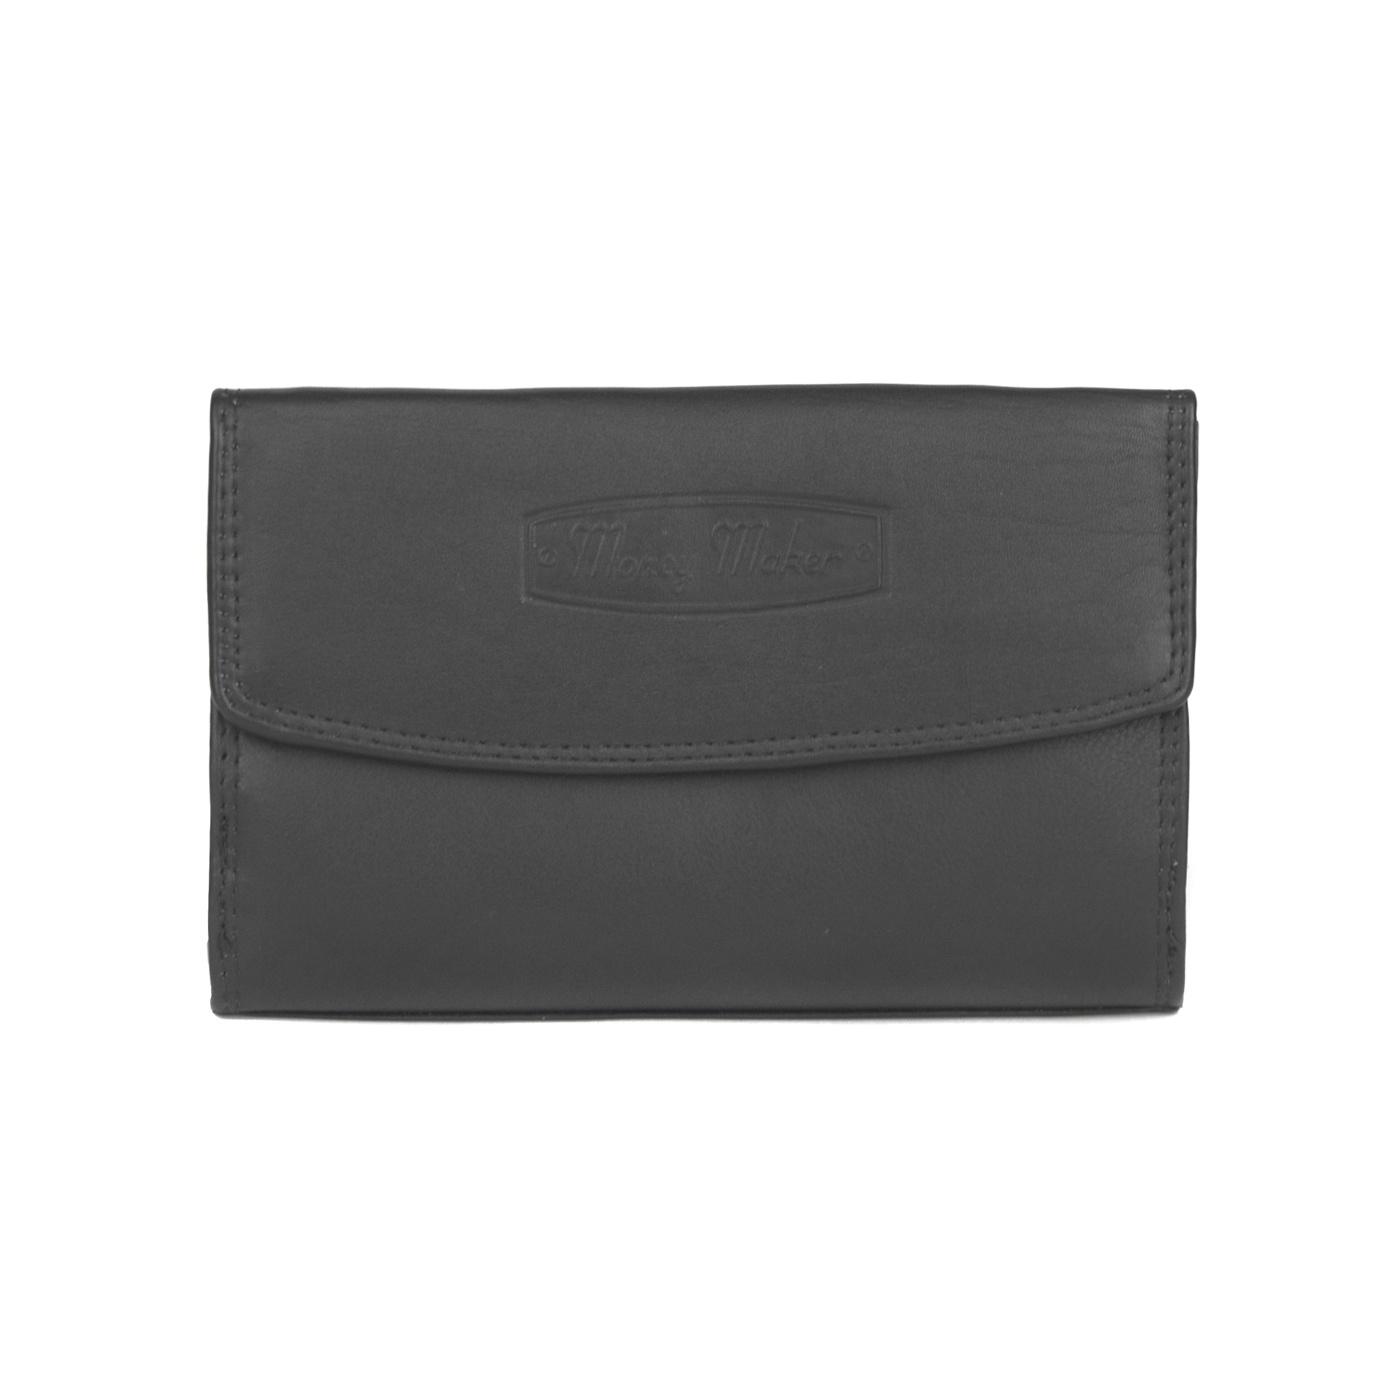 Damski portfel Money Maker - czarny - skóra naturalna